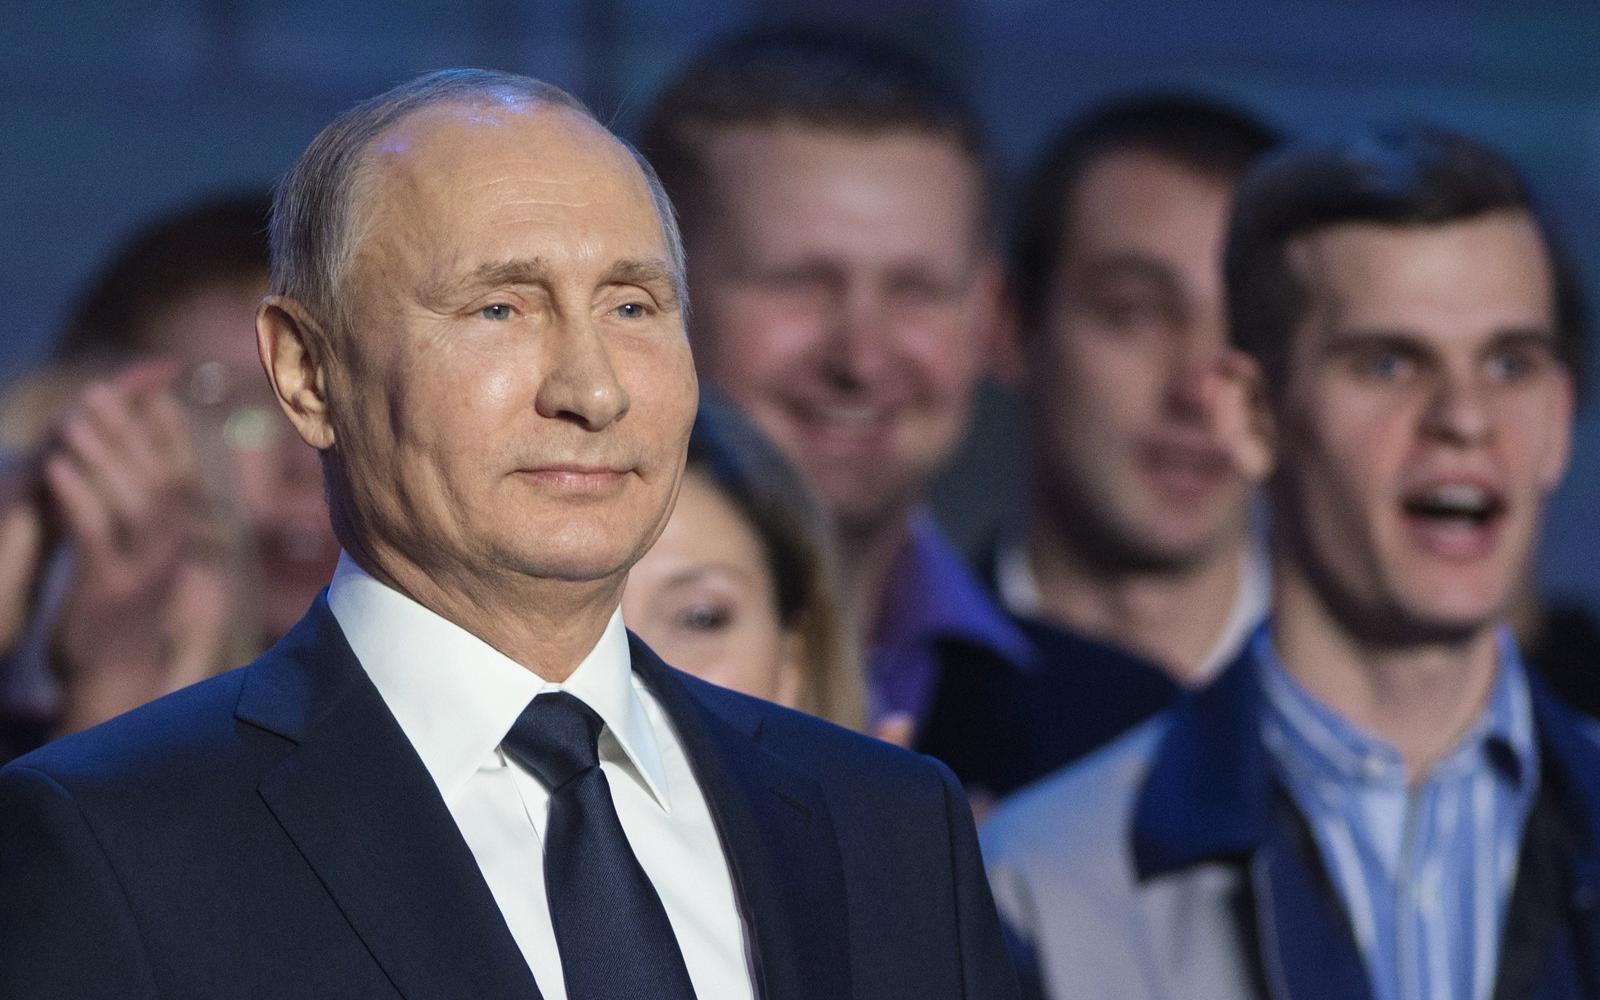 Hogyan keresett pénzt Putyin?)